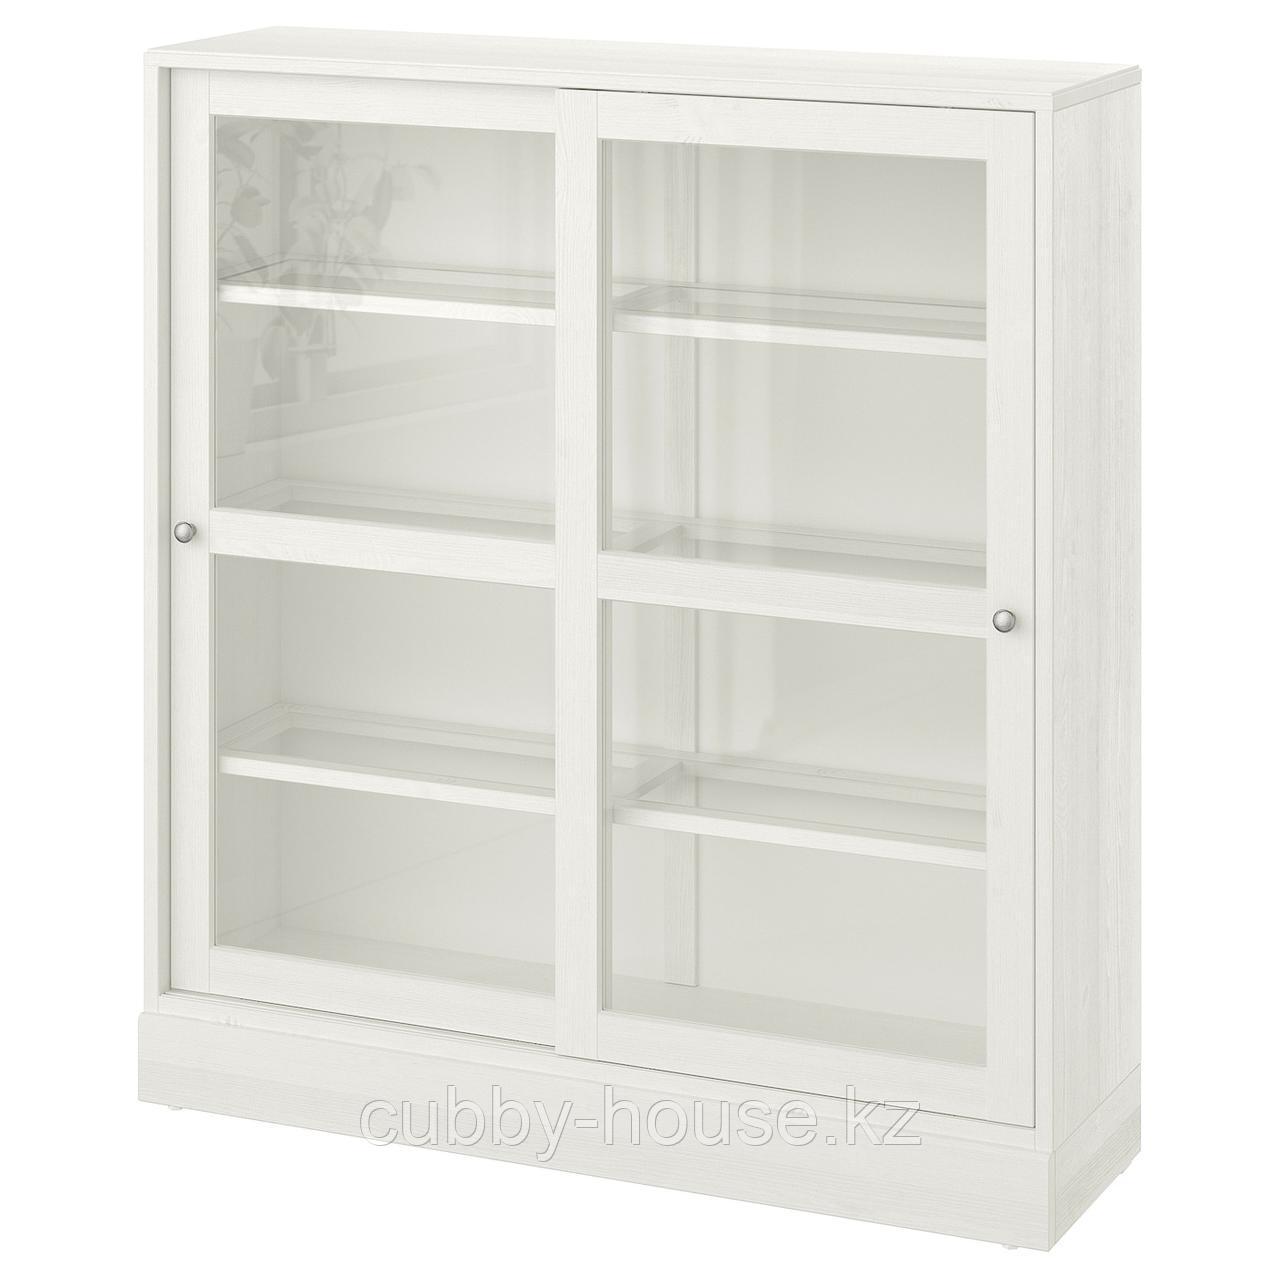 ХАВСТА Шкаф-витрина с цоколем, белый прозрачное стекло, 121x37x134 см